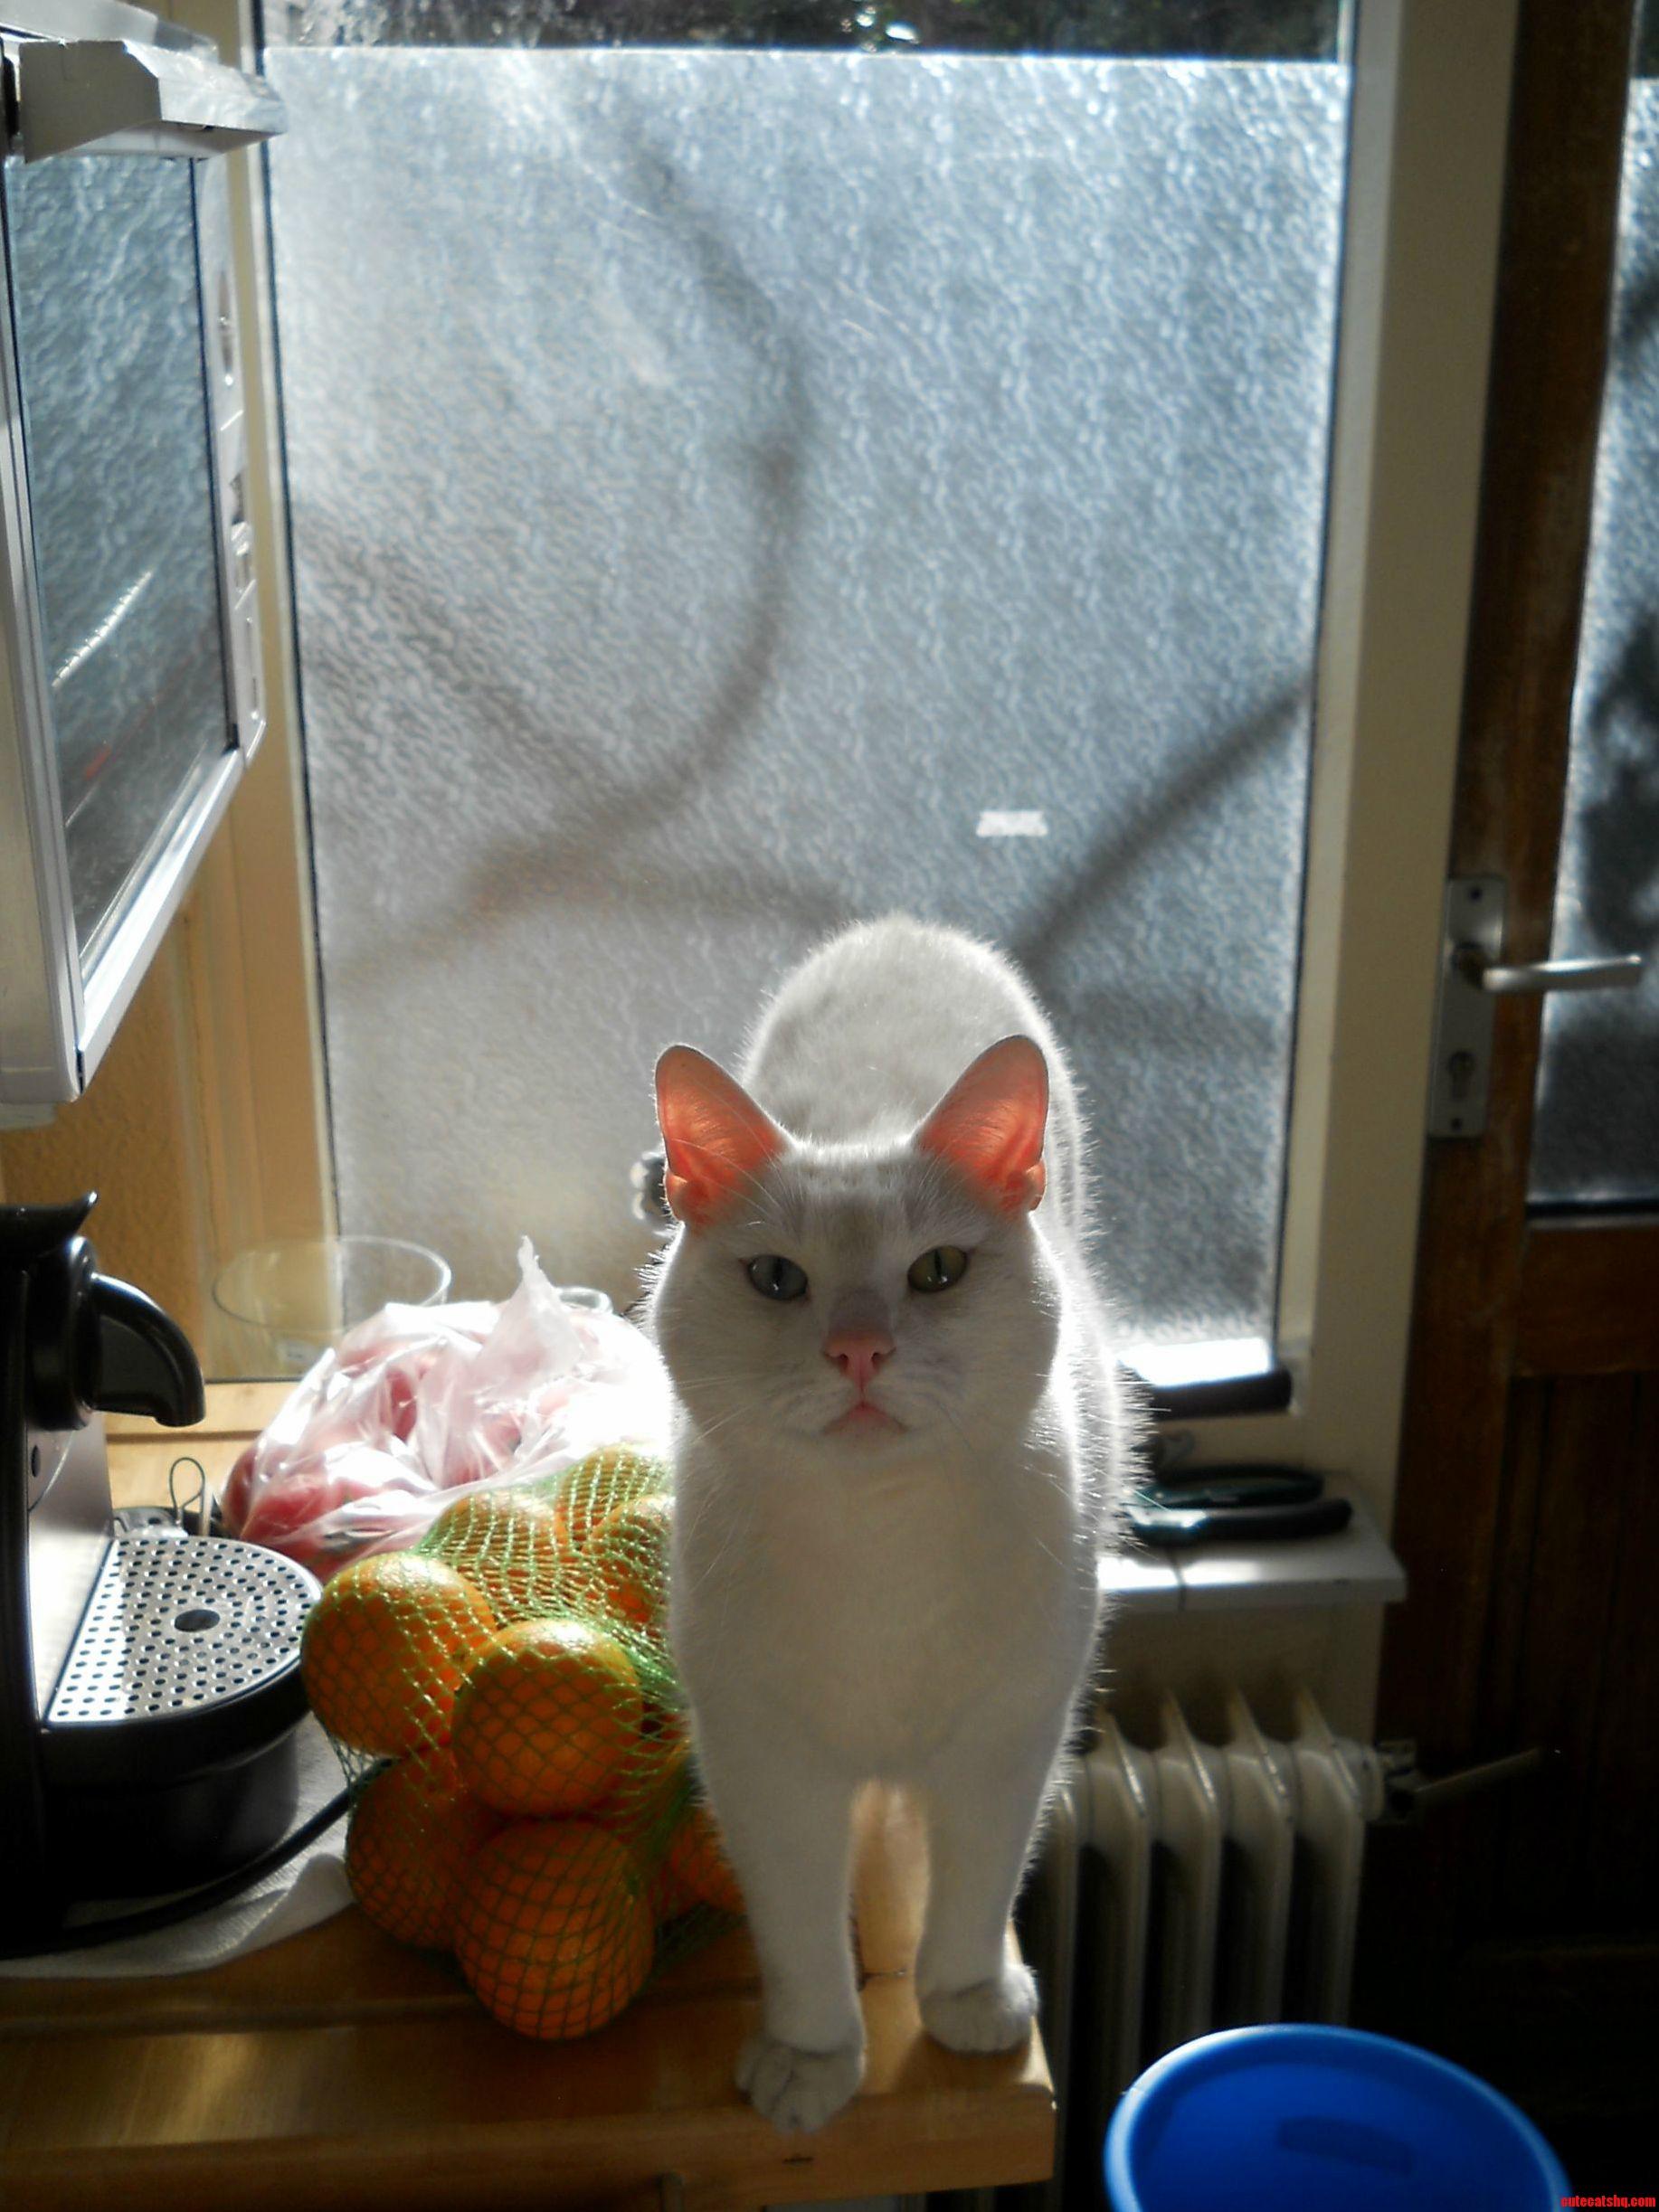 Our Cat Ninja.